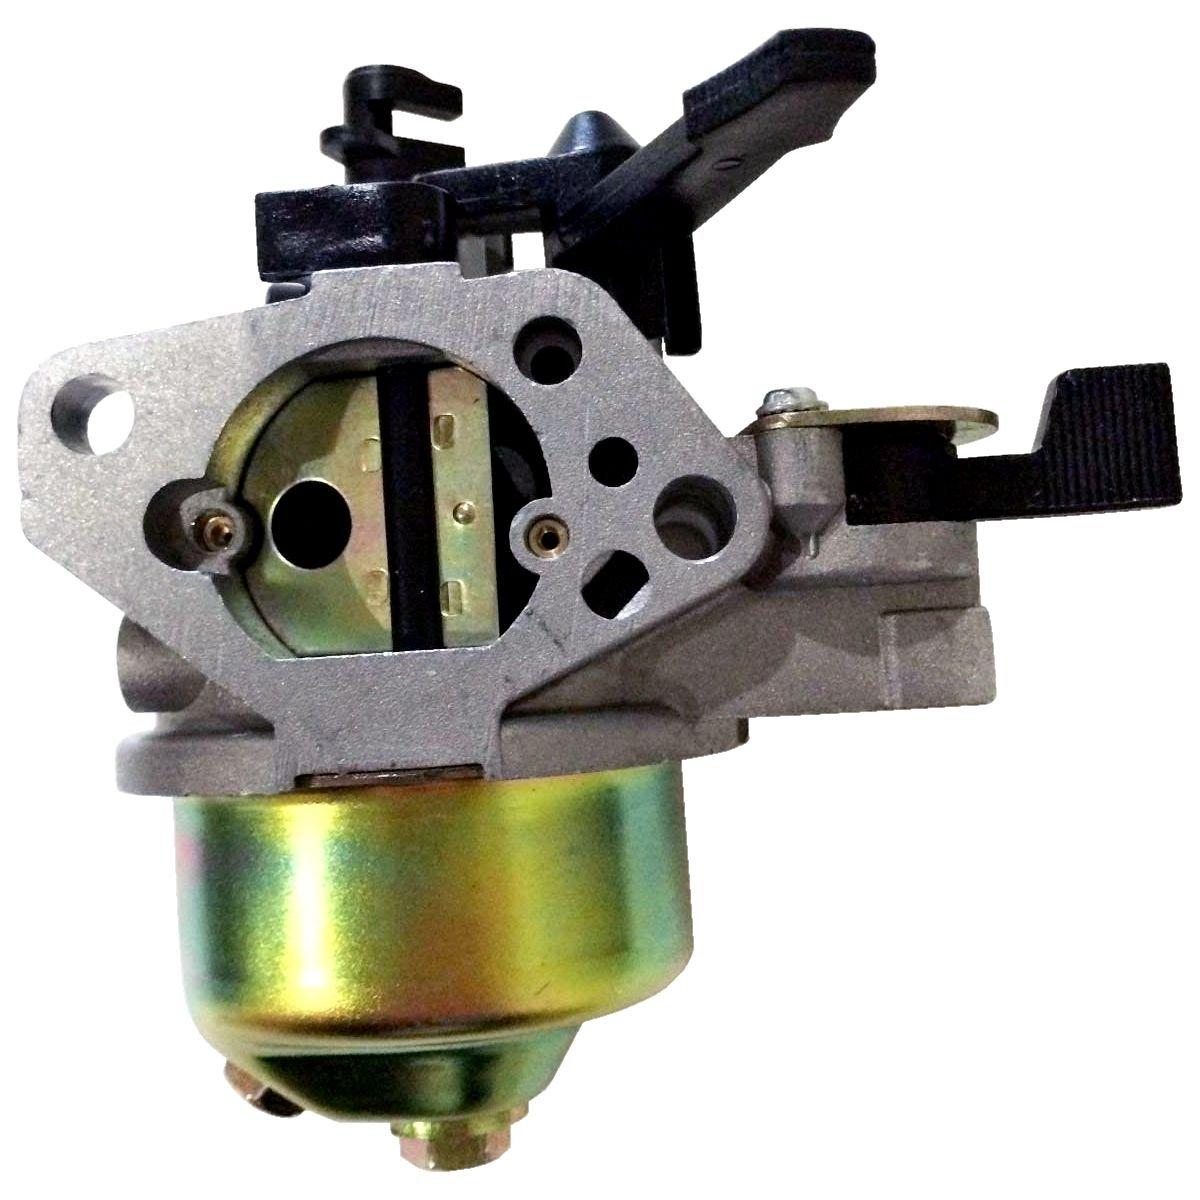 Auto Express JINGKE Kinzo Water Pump Pressure Washer 5.5 6.5HP 168FA 168FB Carburetor Assy